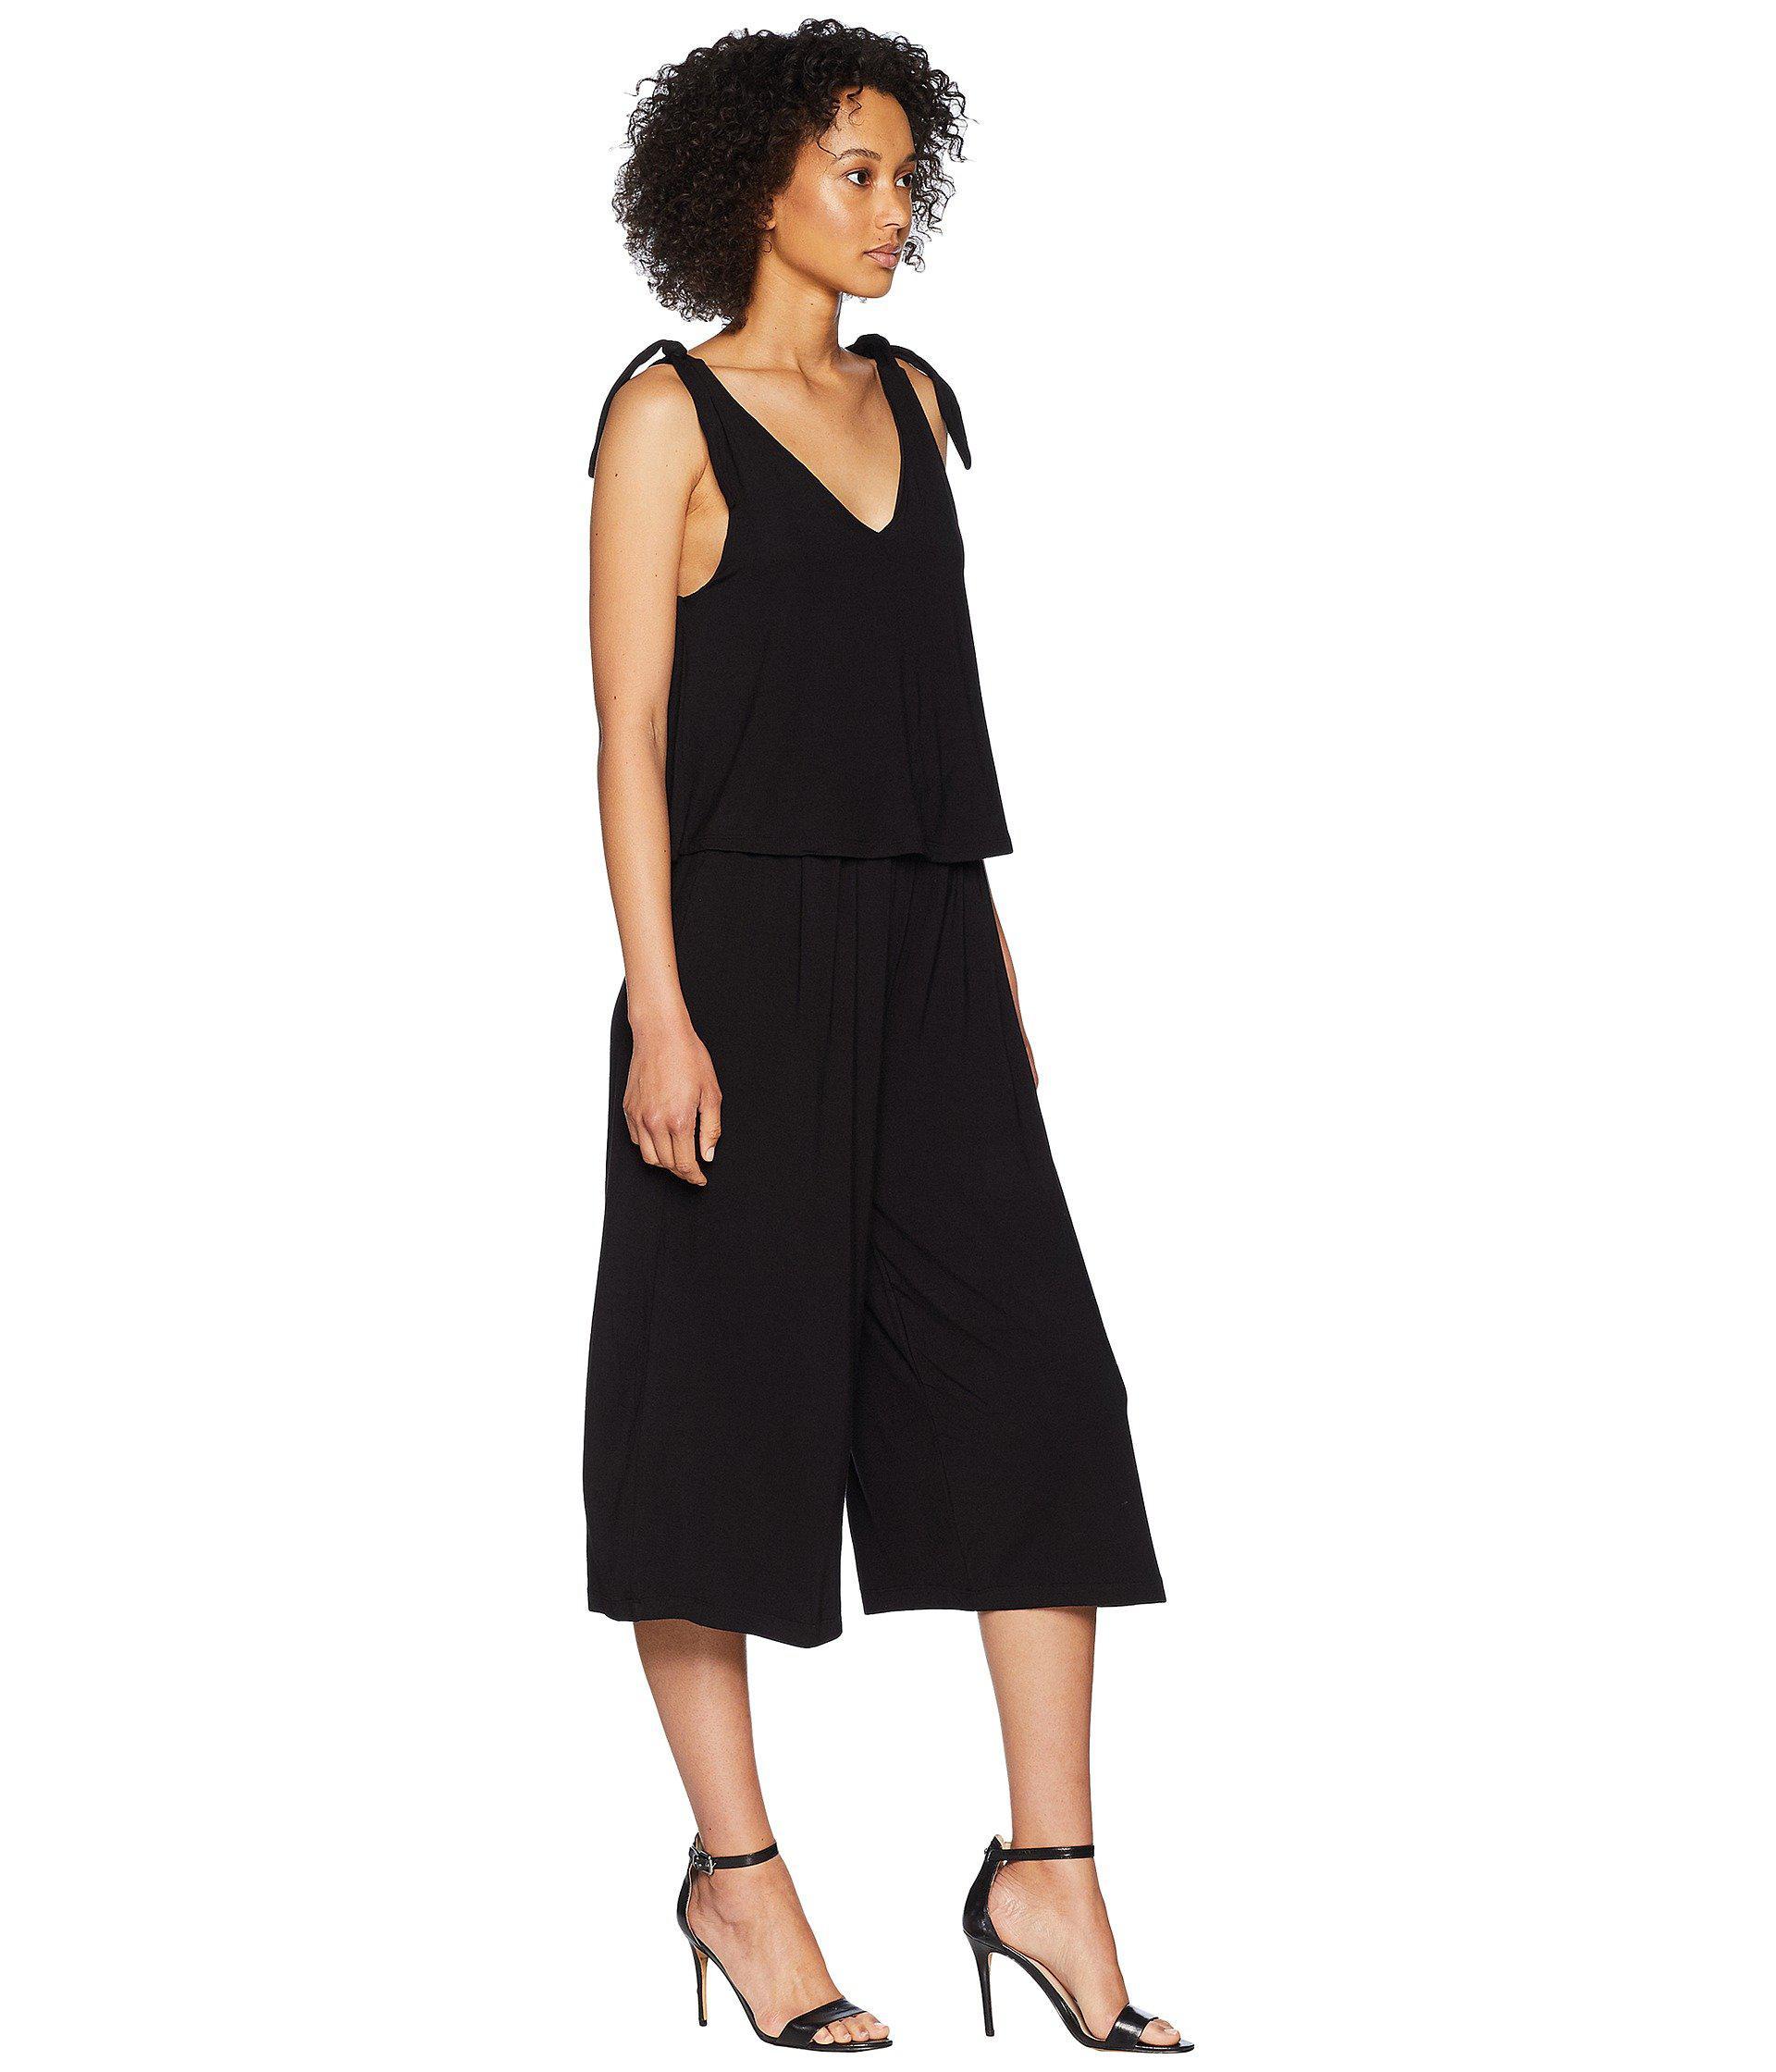 6a989fd5d16f7 ... Vicky Knit Jumpsuit (black) Women s Jumpsuit   Rompers One. View  fullscreen